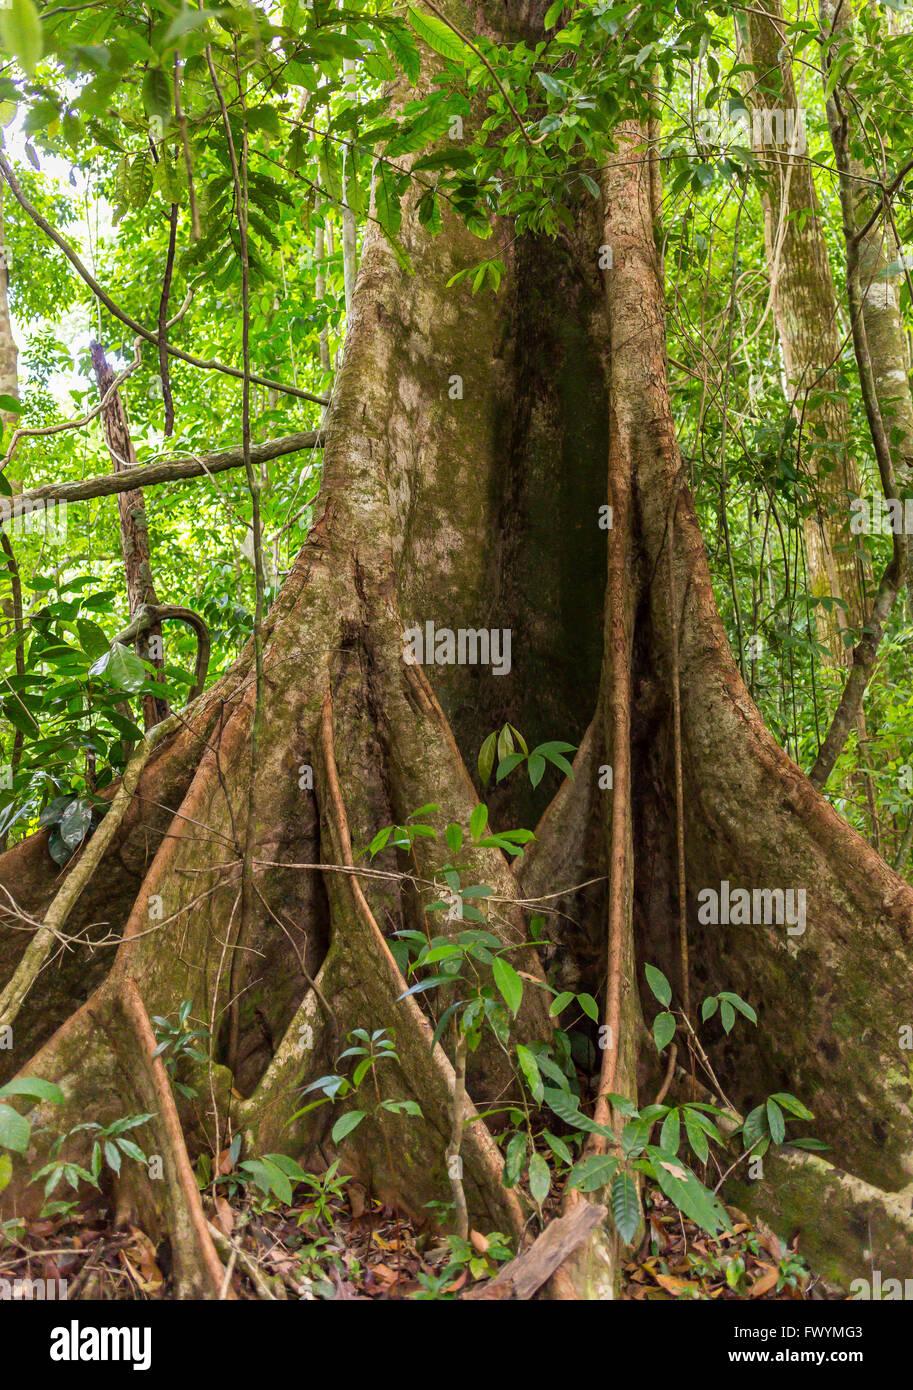 OSA PENINSULA, COSTA RICA - Royal mahogany tree in primary rain forest. Carapa guianensis - Stock Image